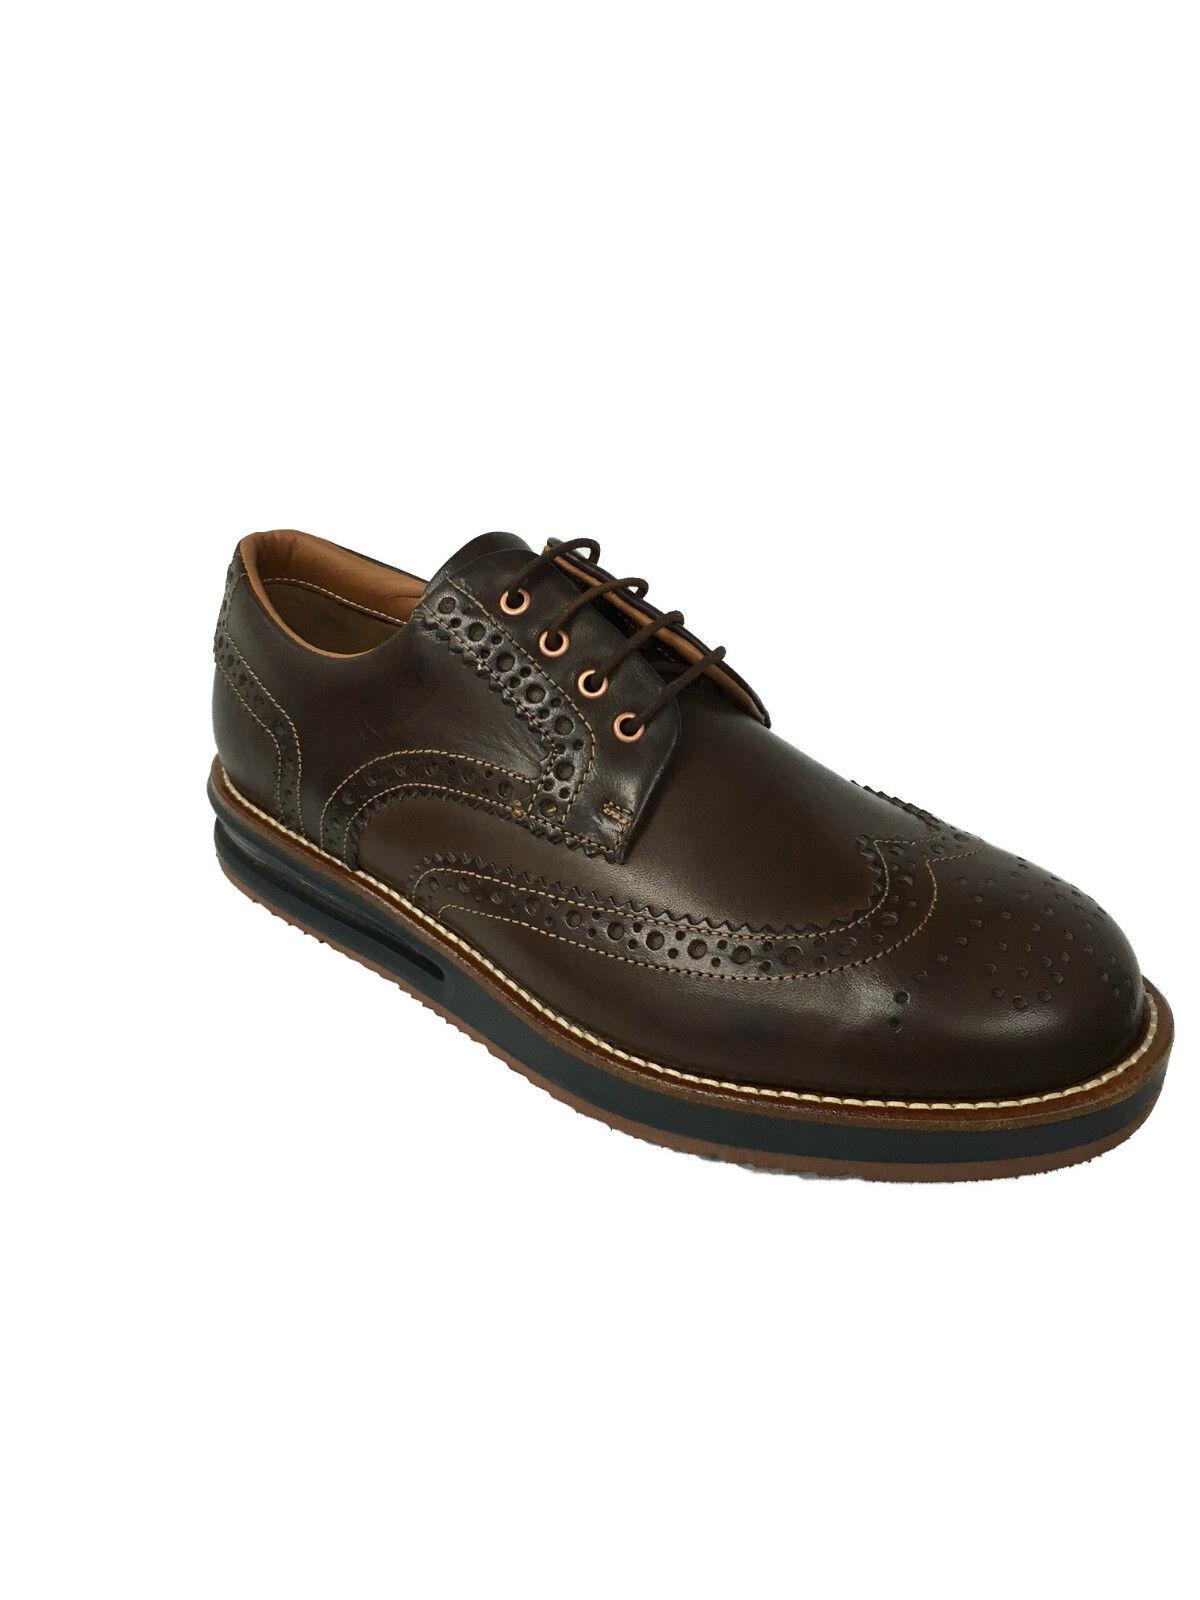 BARLEYCORN scarpa uomo allacciata moro mod COWHIDE 100% pelle MADE IN ITALY